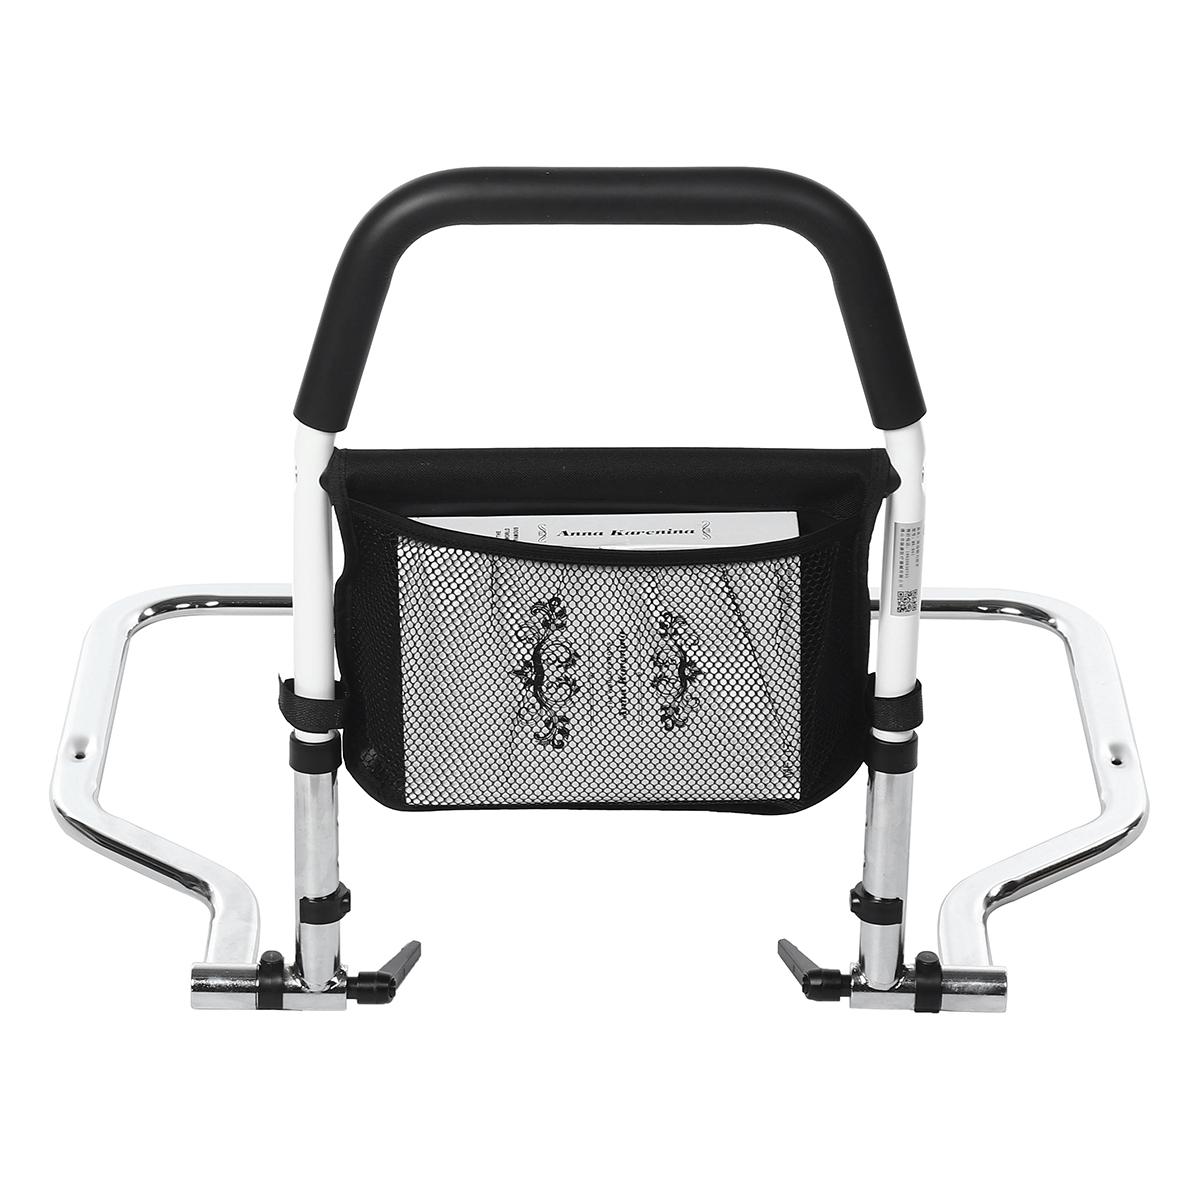 Adjustable Bed Rail Bedside Assist Handrail Handle for Elderly Patients Pregnants